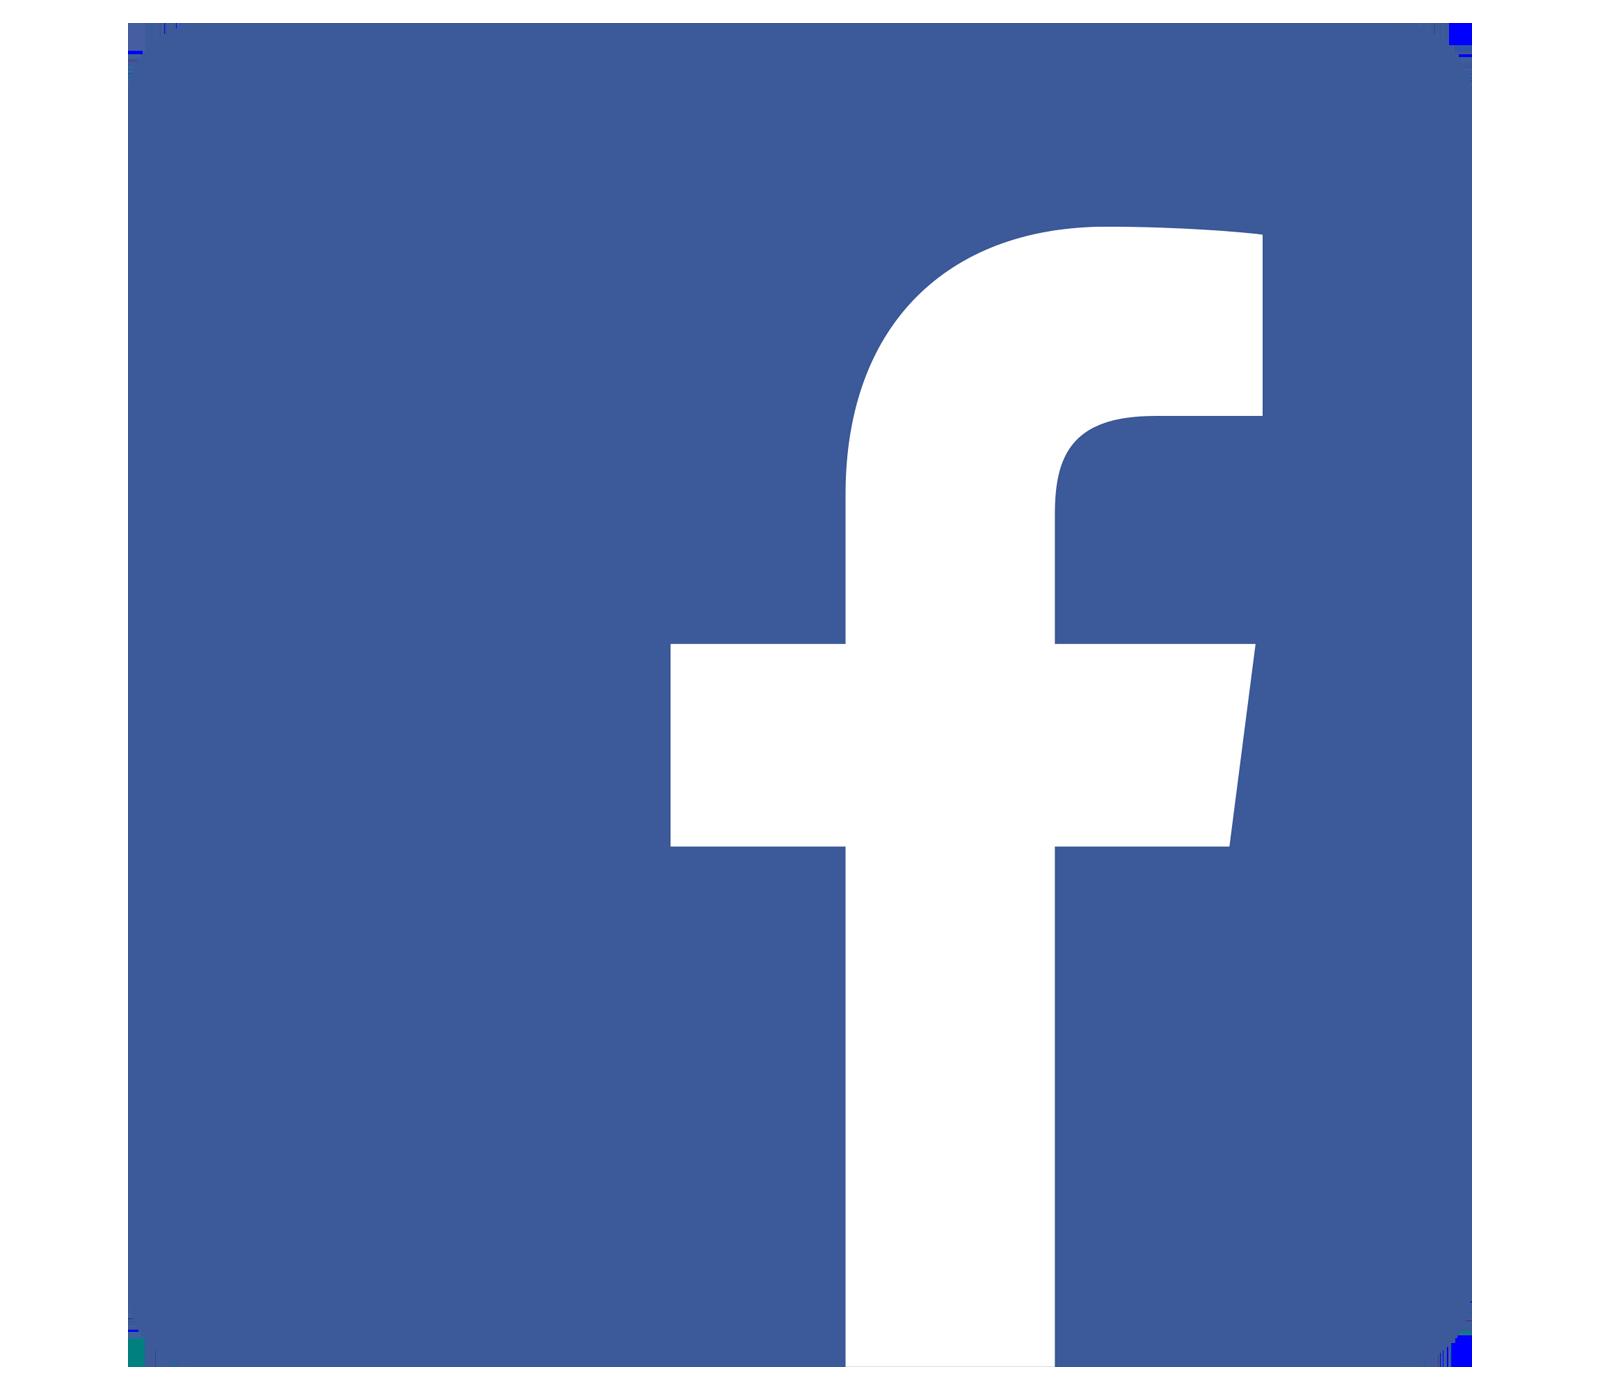 Facebook club d'entreprises